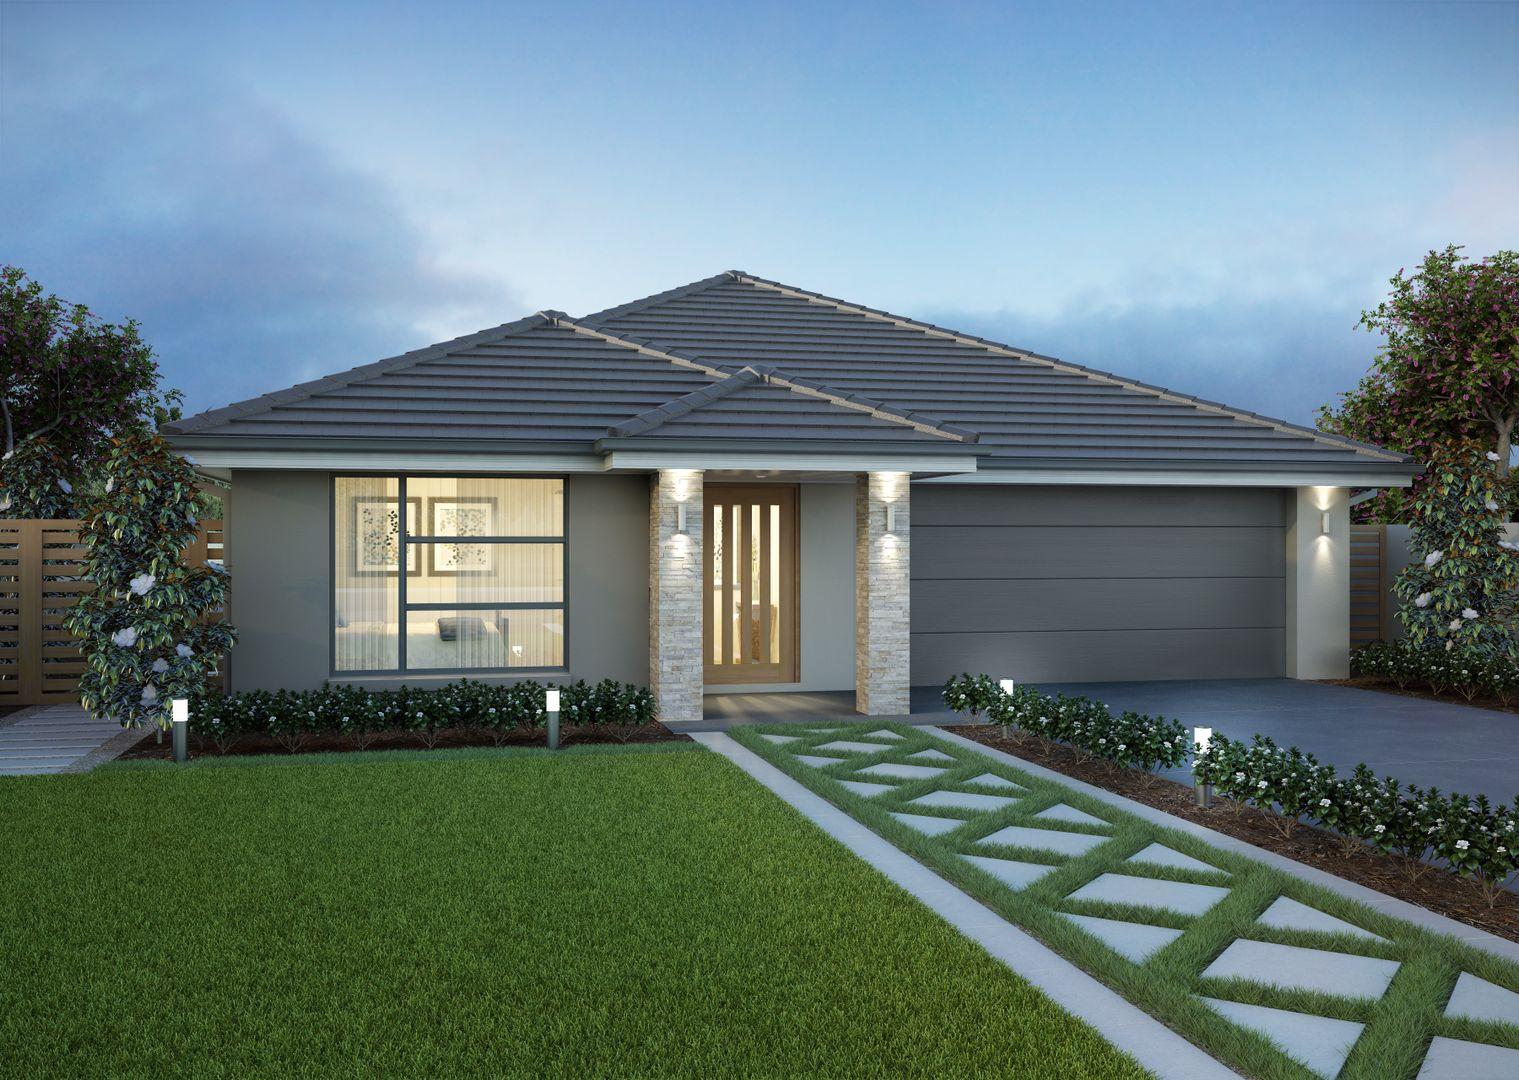 Lot 153 New Road, Ridge View Estate, Narangba QLD 4504, Image 0